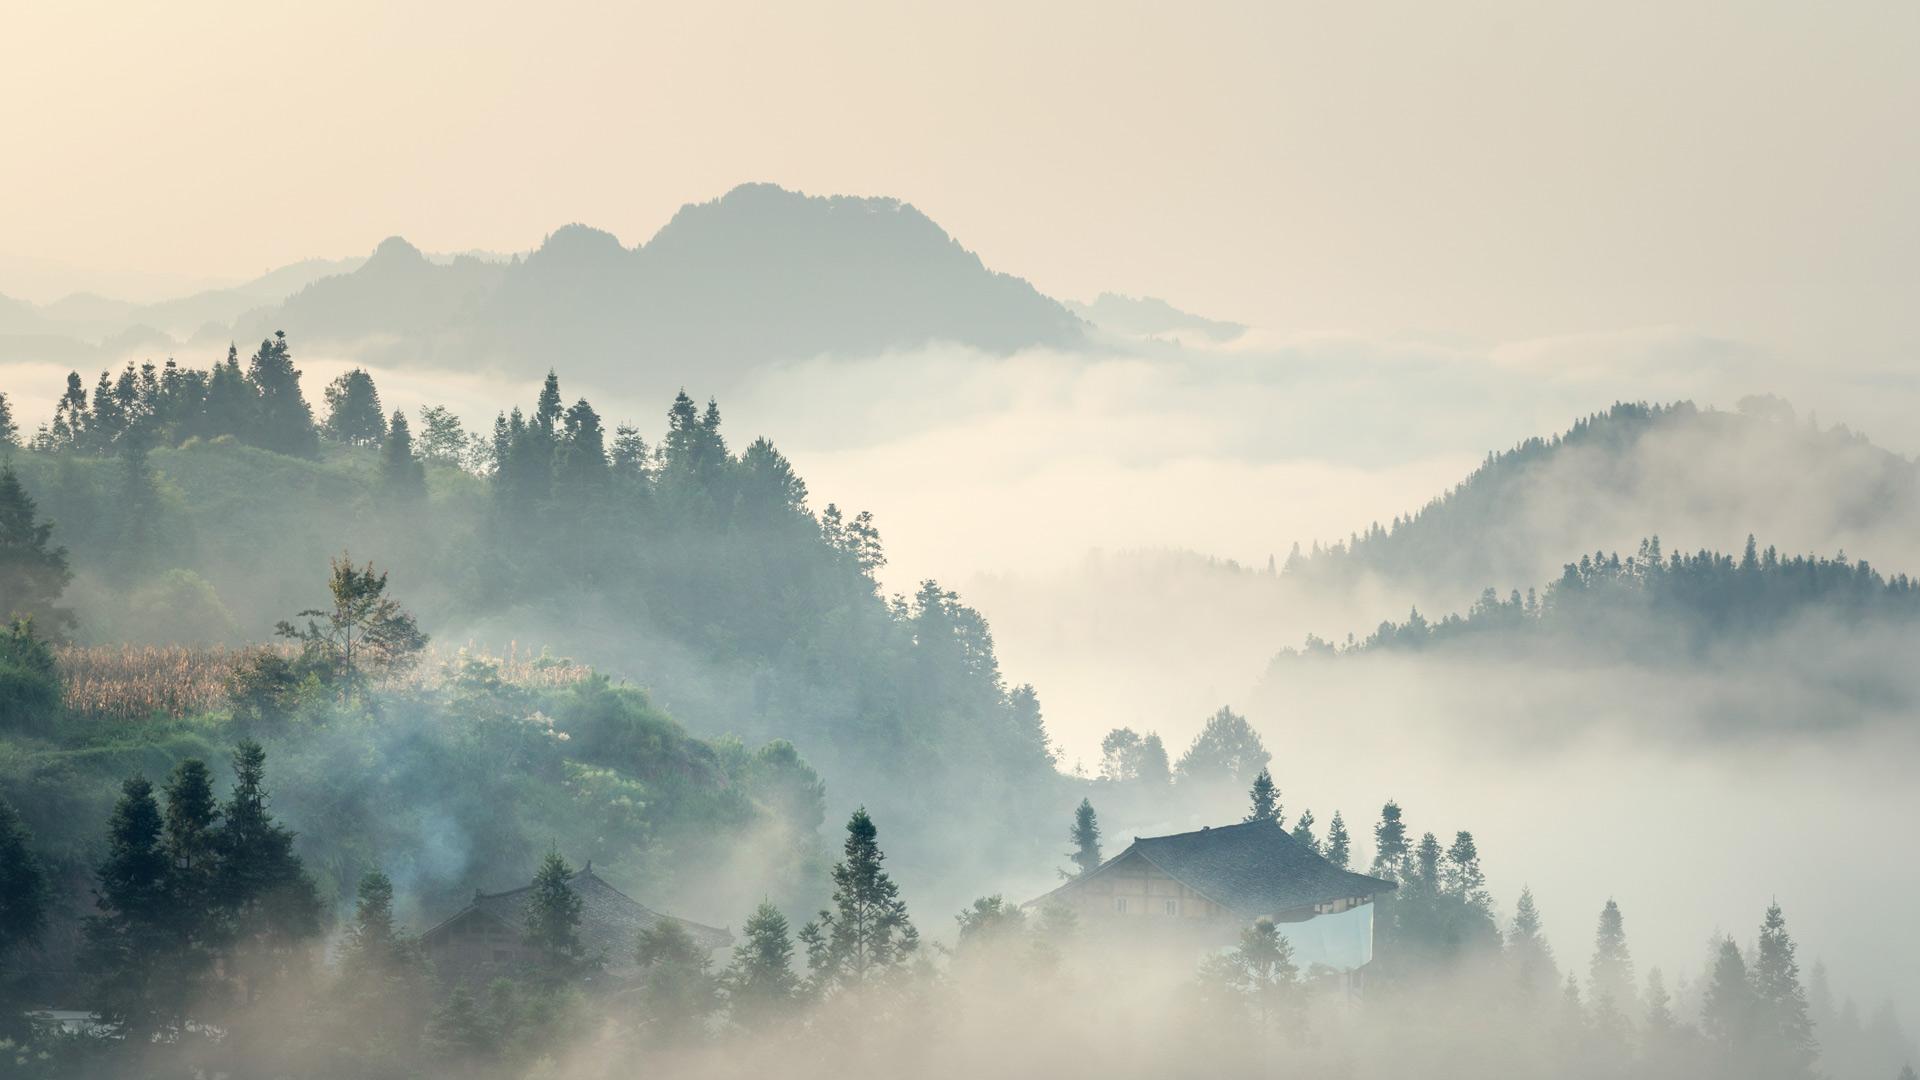 Qingming2021_ZH-CN6154314555